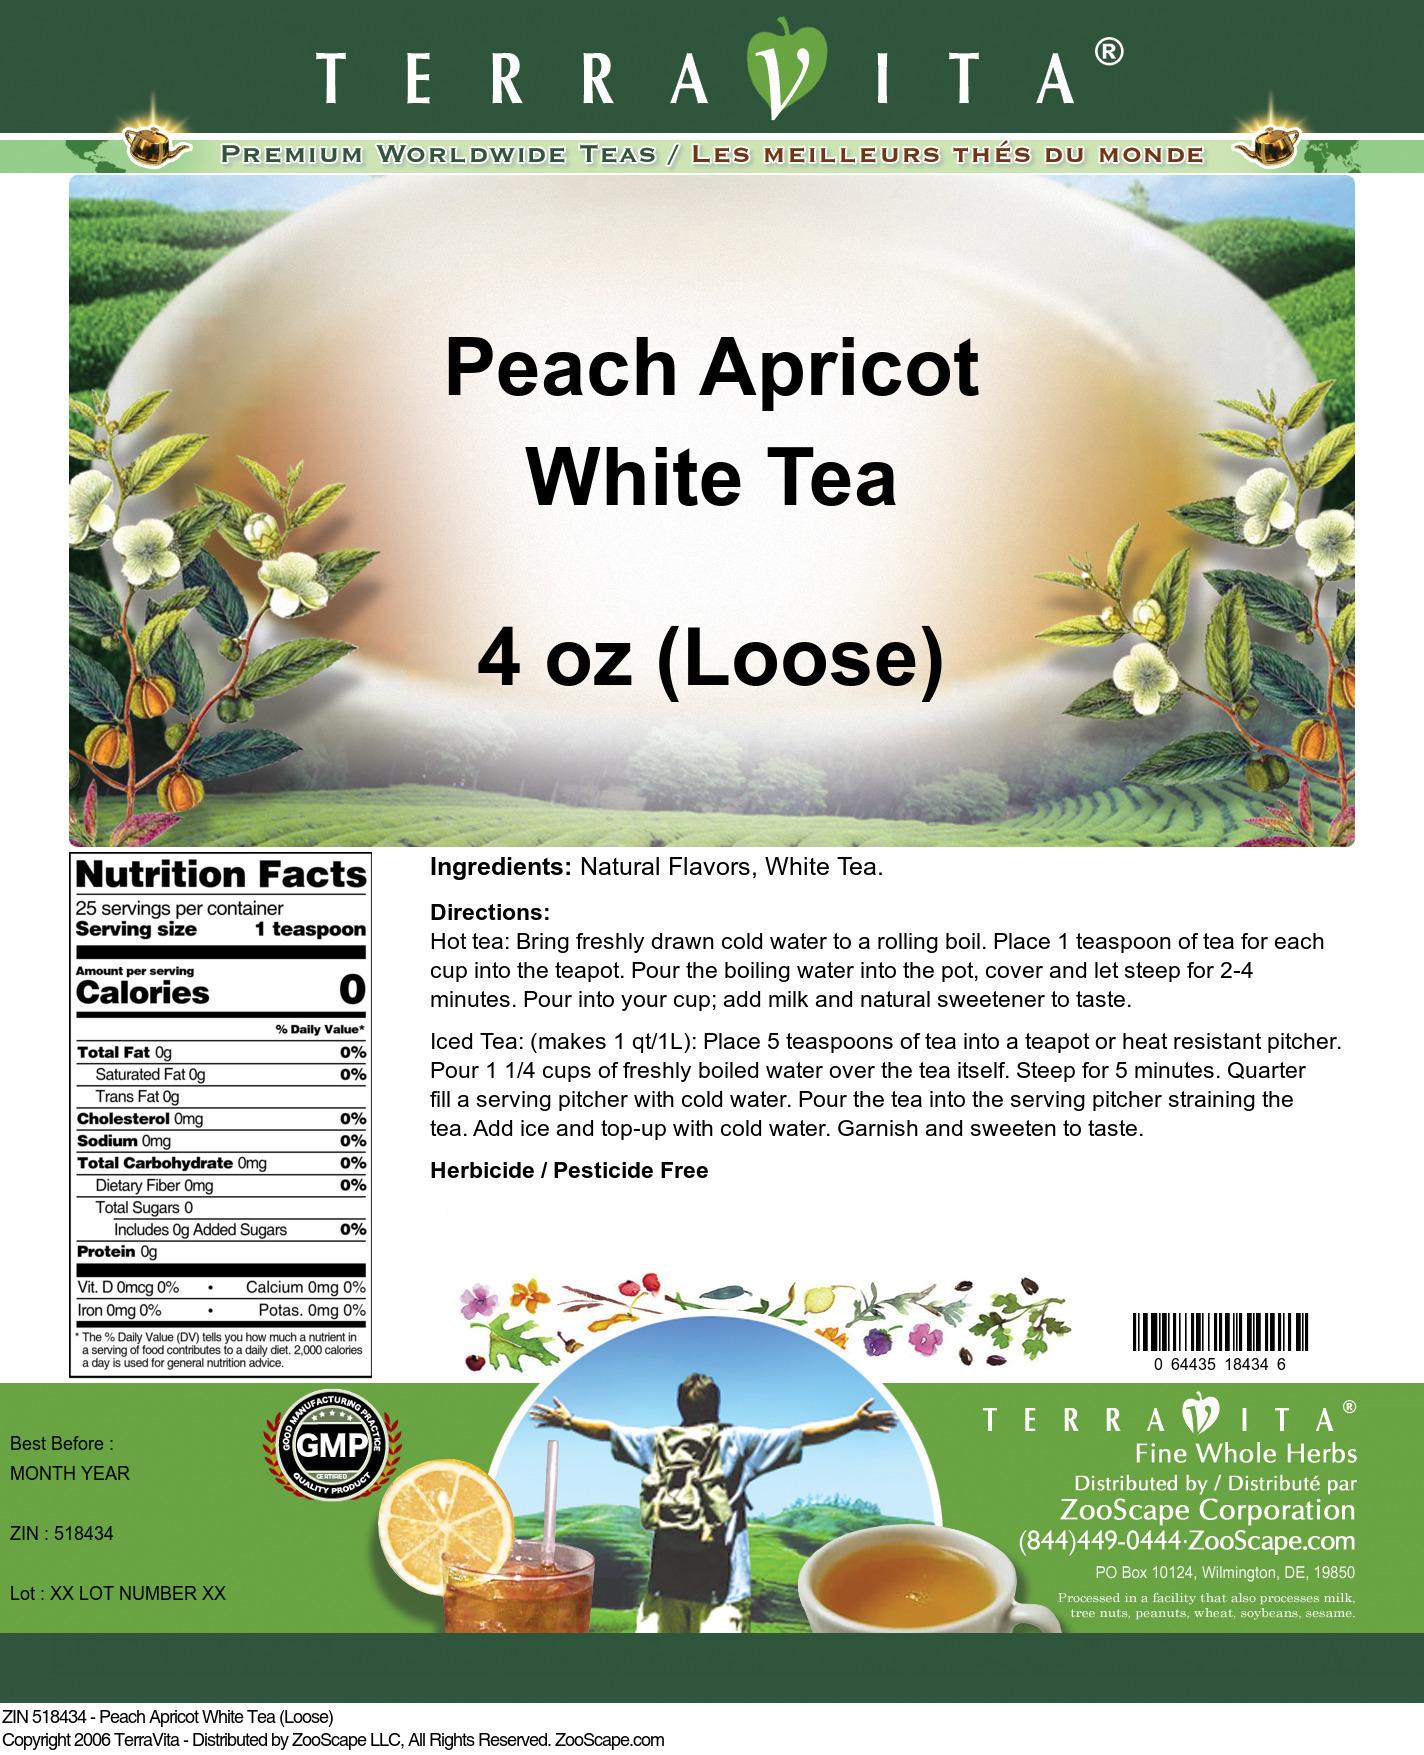 Peach Apricot White Tea (Loose)